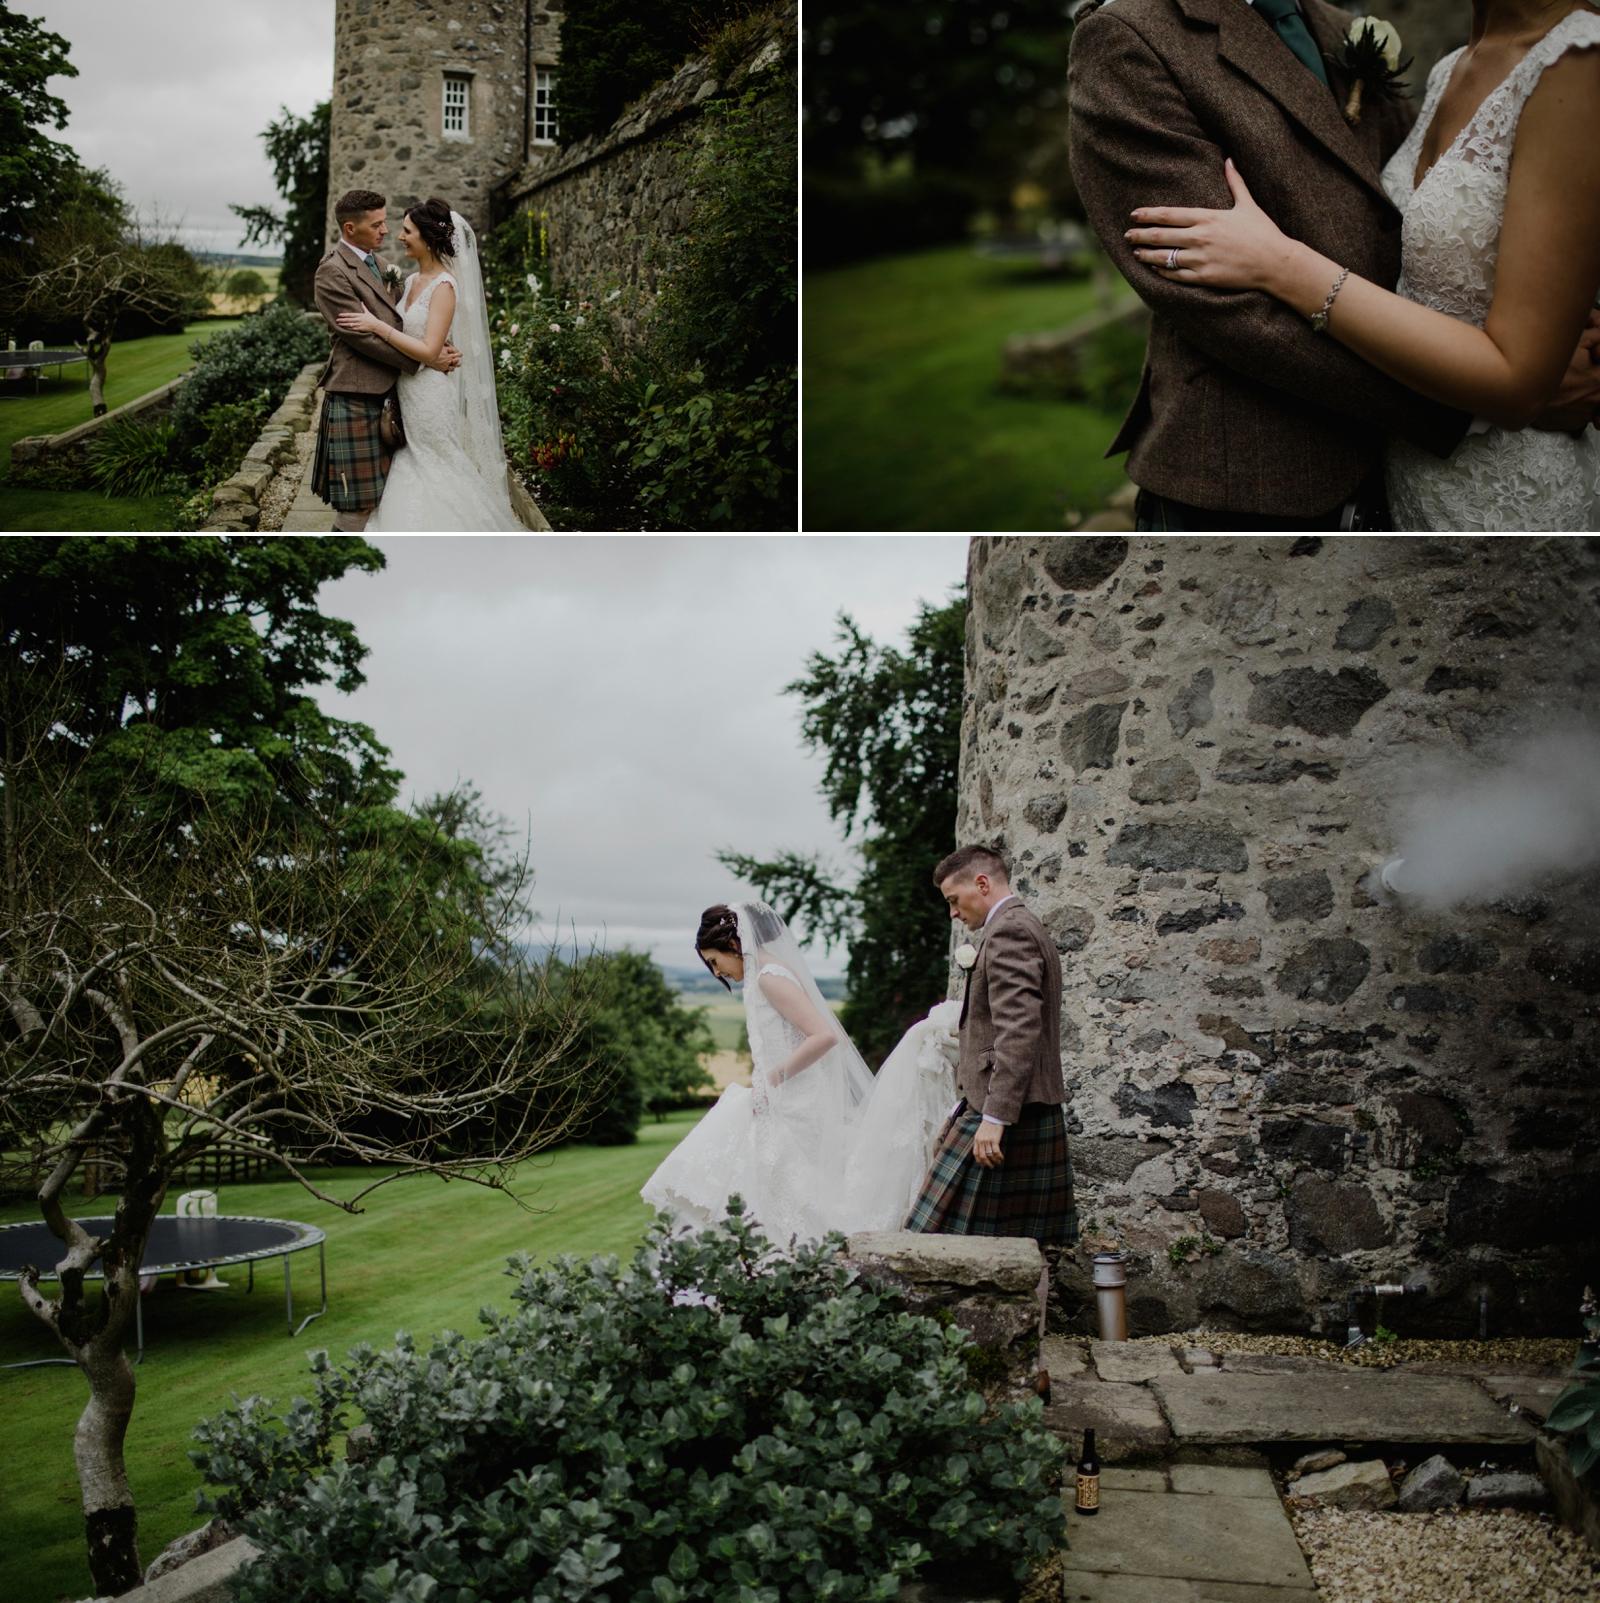 ELLIE_GARY_BARRA_CASTLE_WEDDING_ZOE_ALEXANDRA_PHOTOGRAPHY-0403.jpg